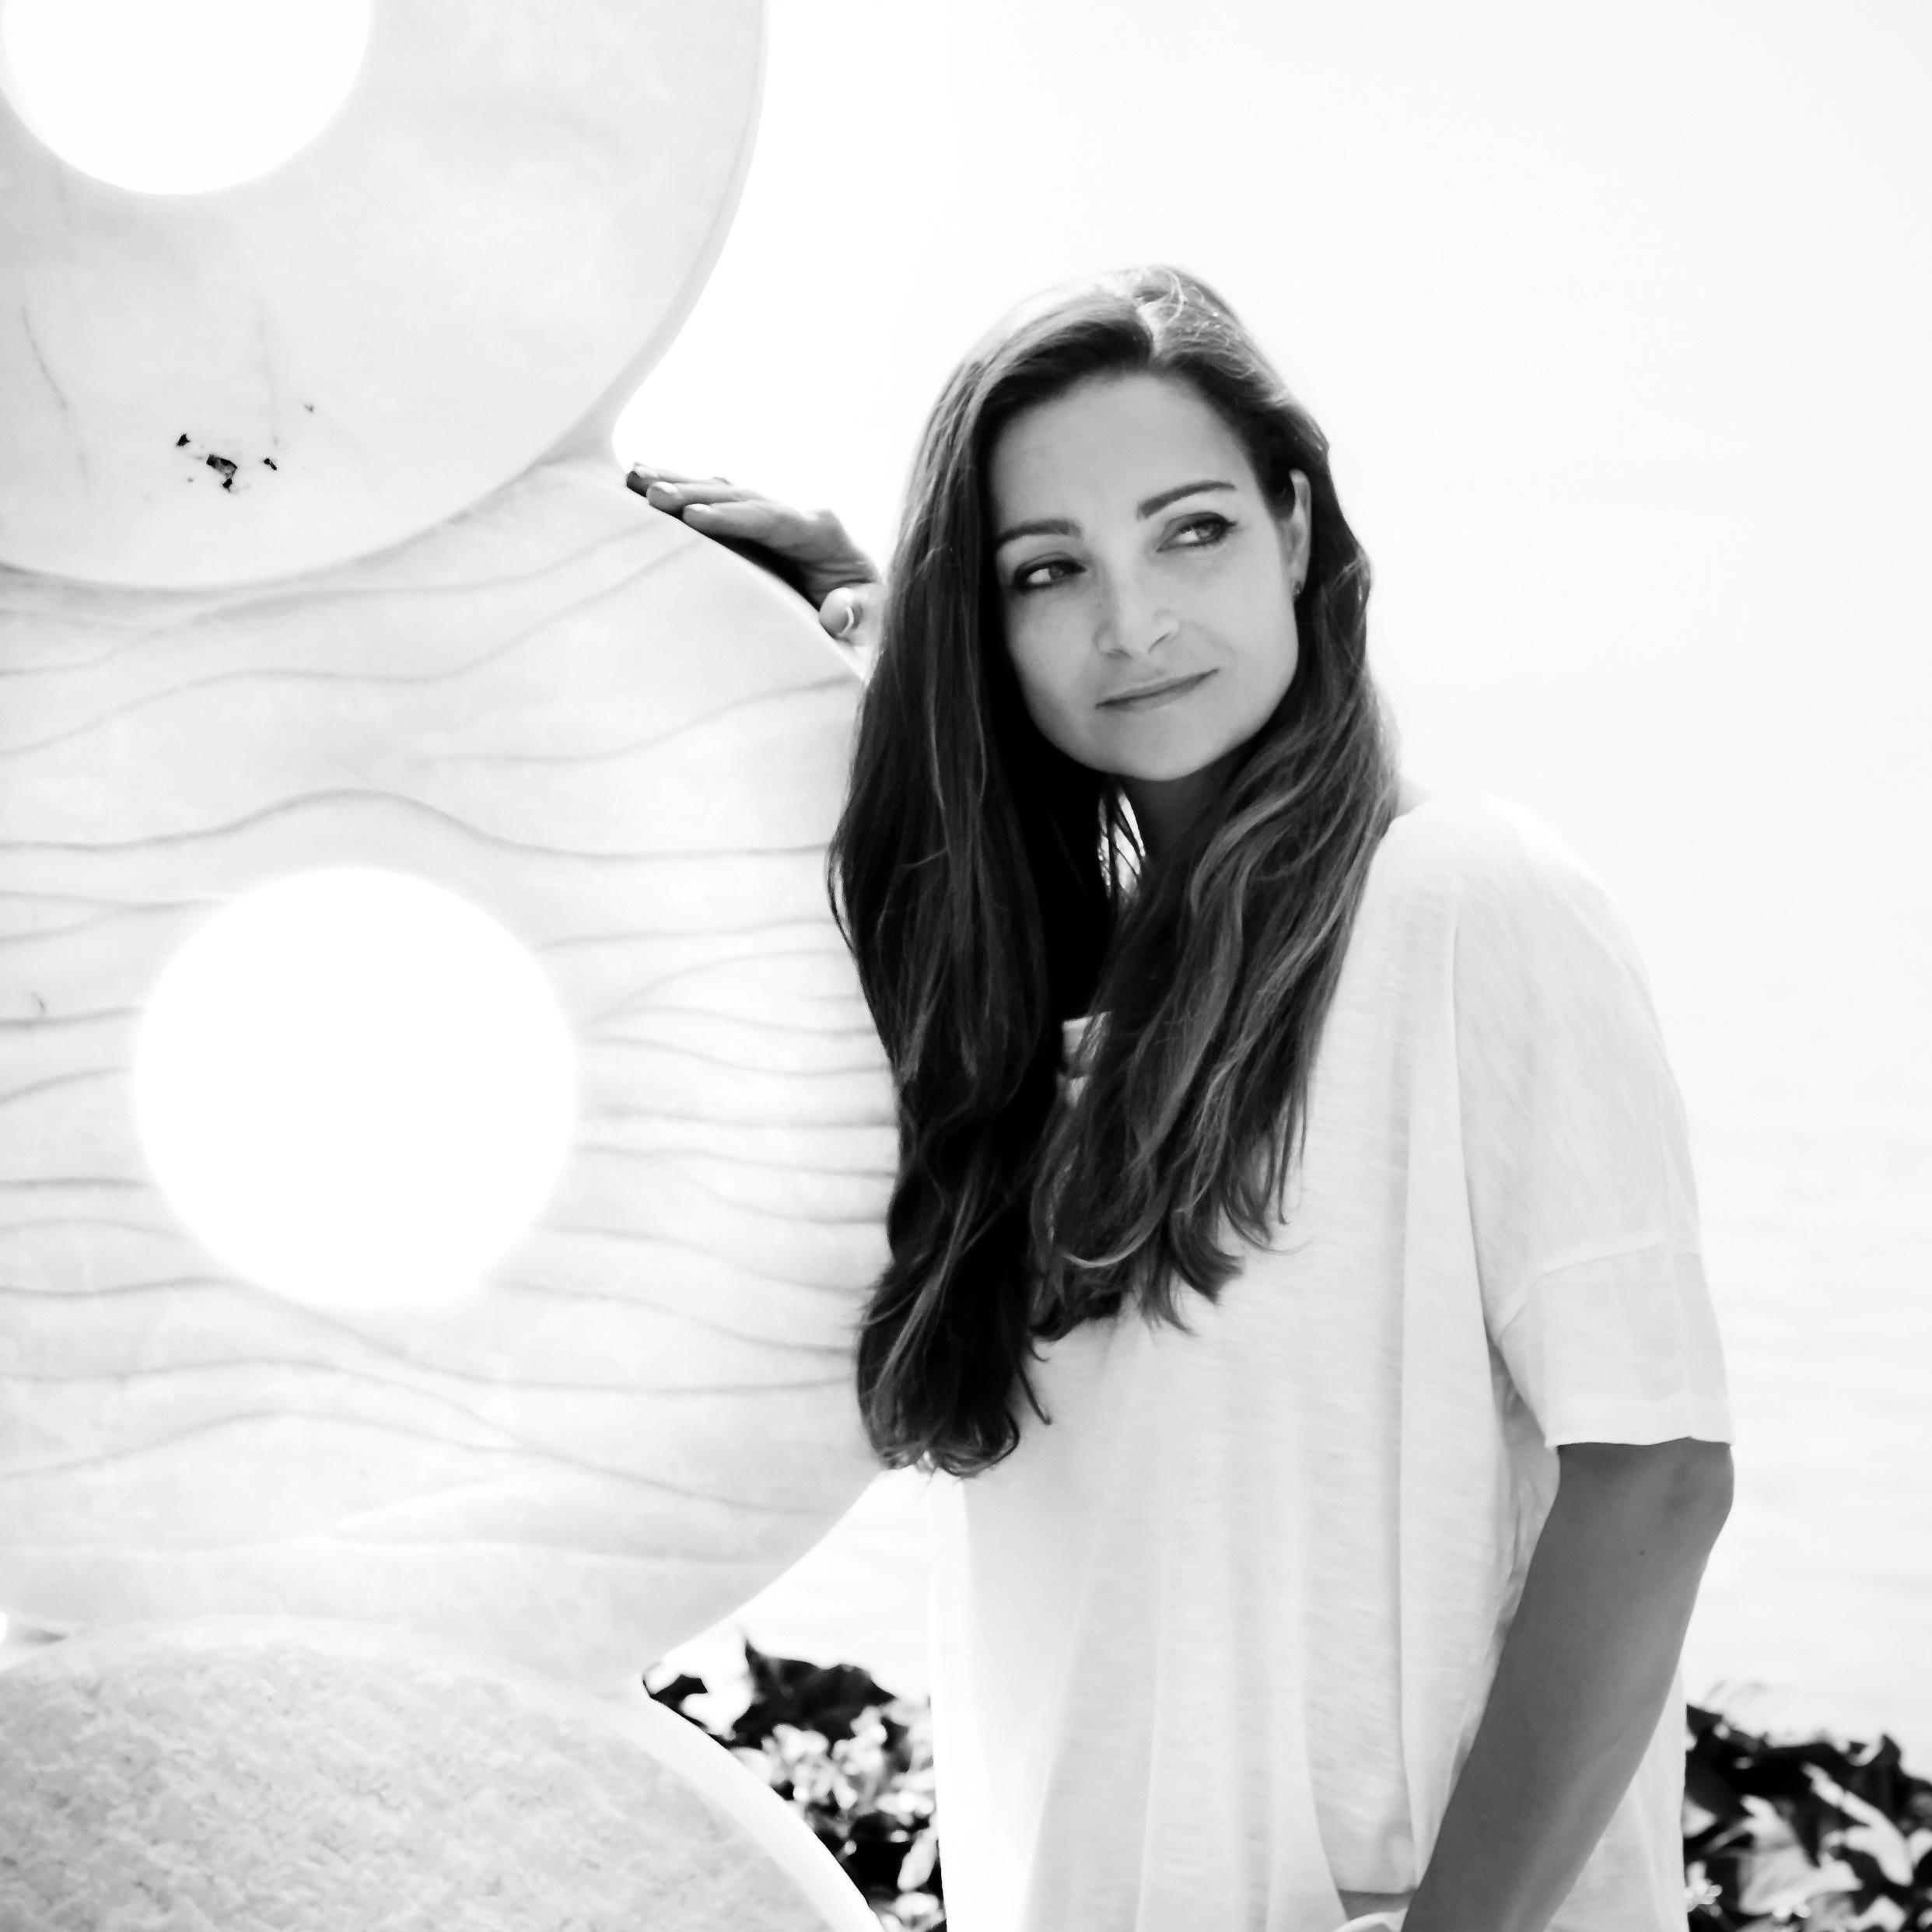 Alexia+Weill.jpg